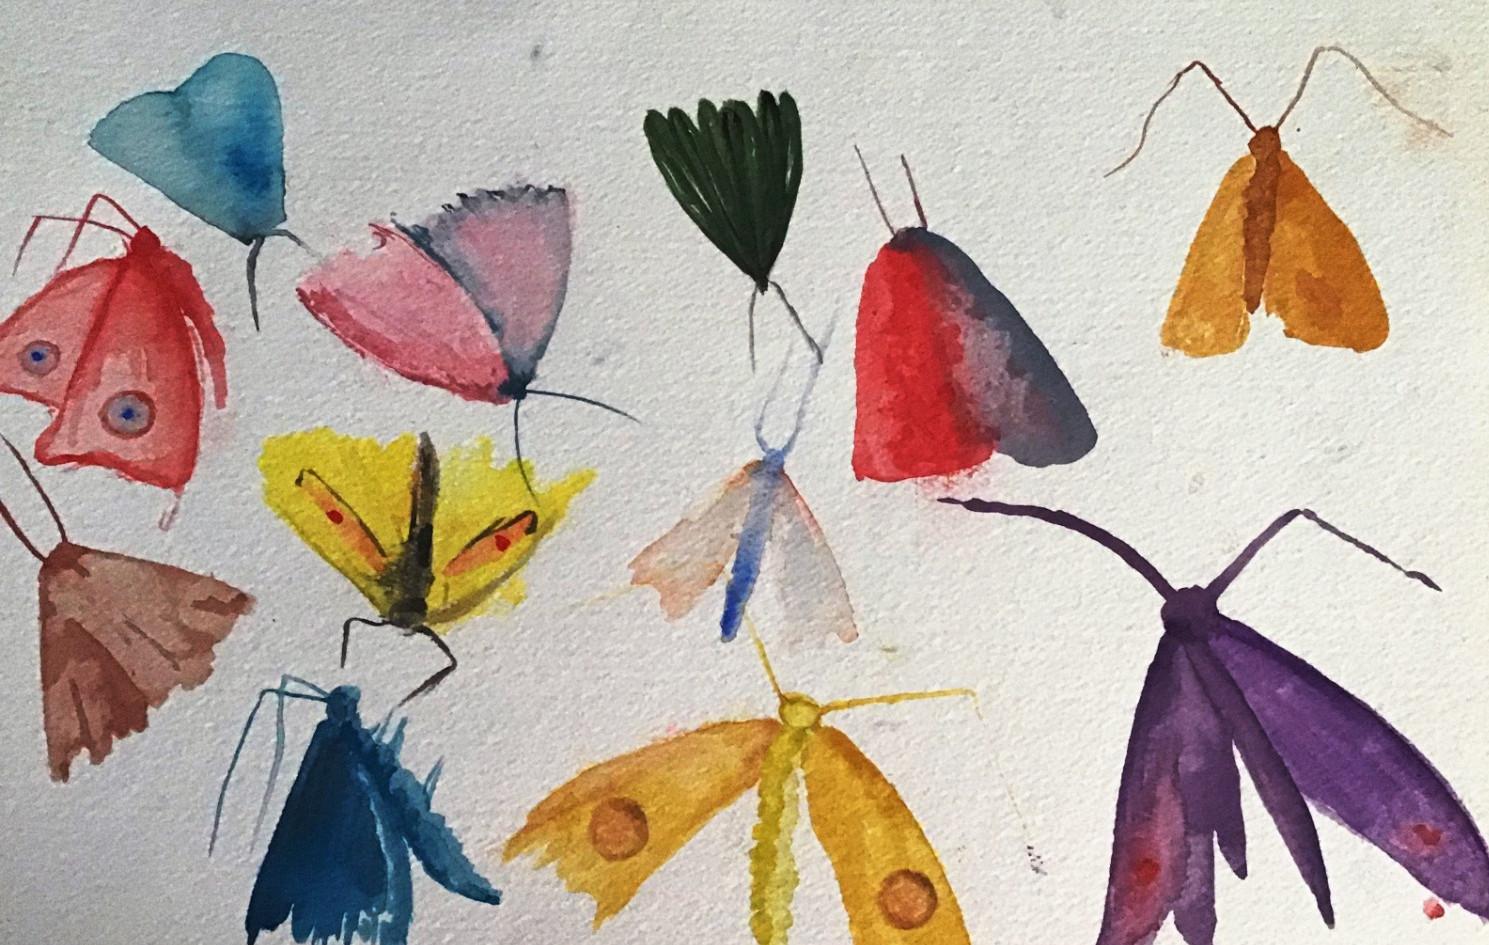 Modeled after Allyson Reynolds' Moth series